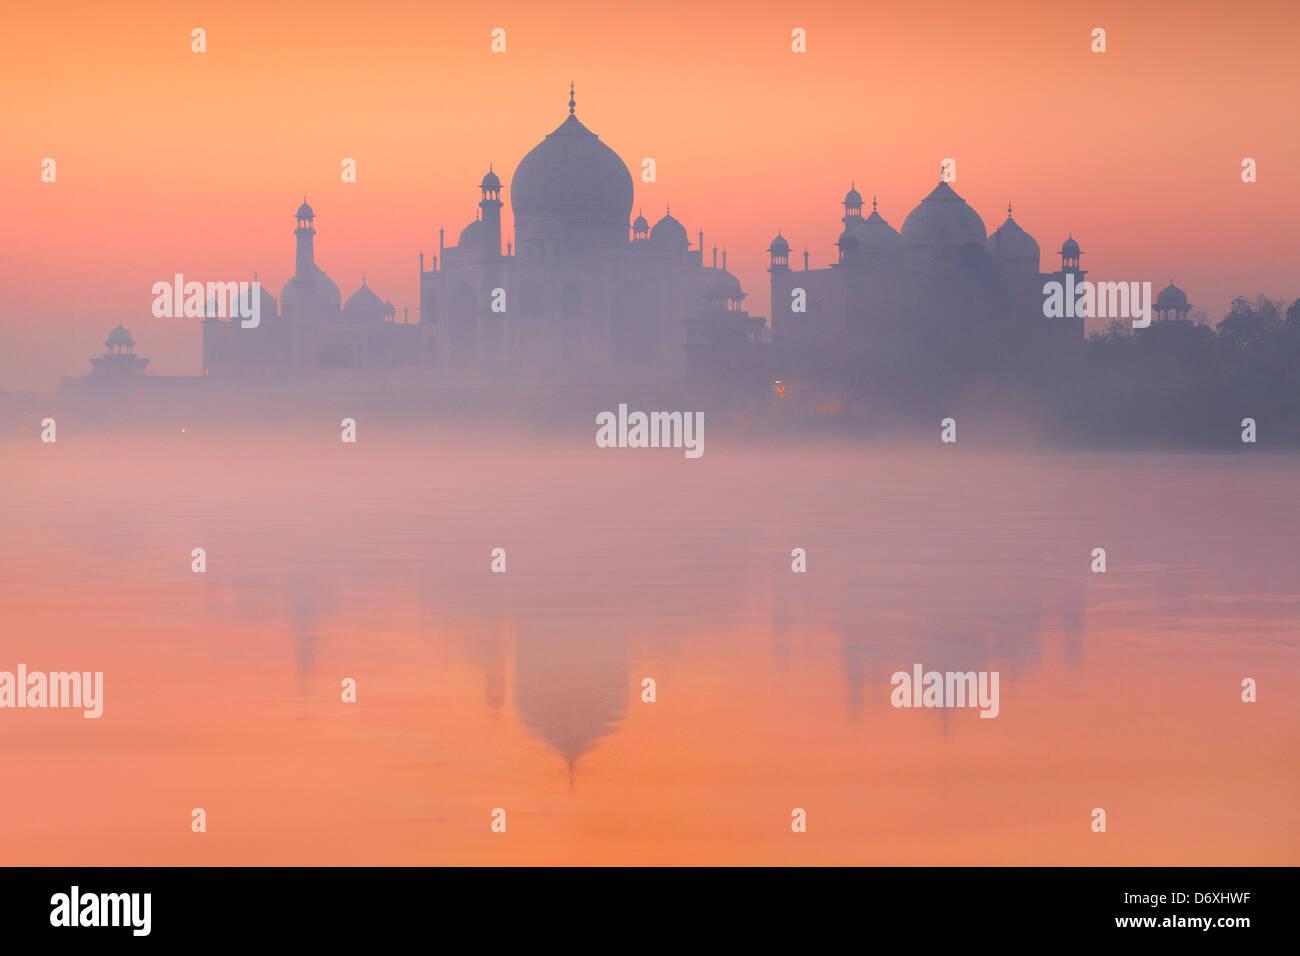 Sunset Taj Mahal y el río Yamuna, Agra, Uttar Pradesh, India LA UNESCO Imagen De Stock